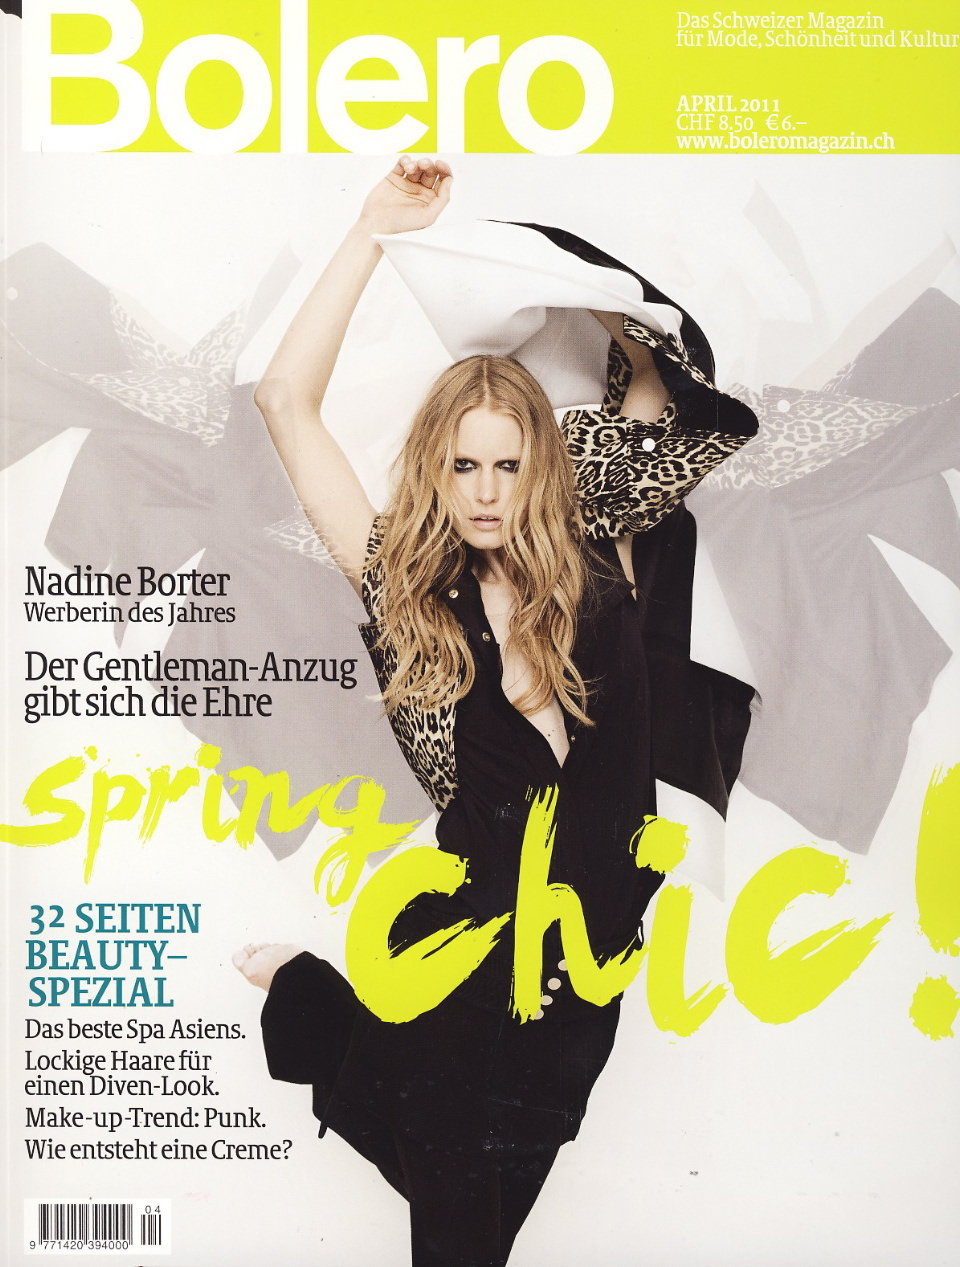 BOLERO-Cover-April-20116.jpeg